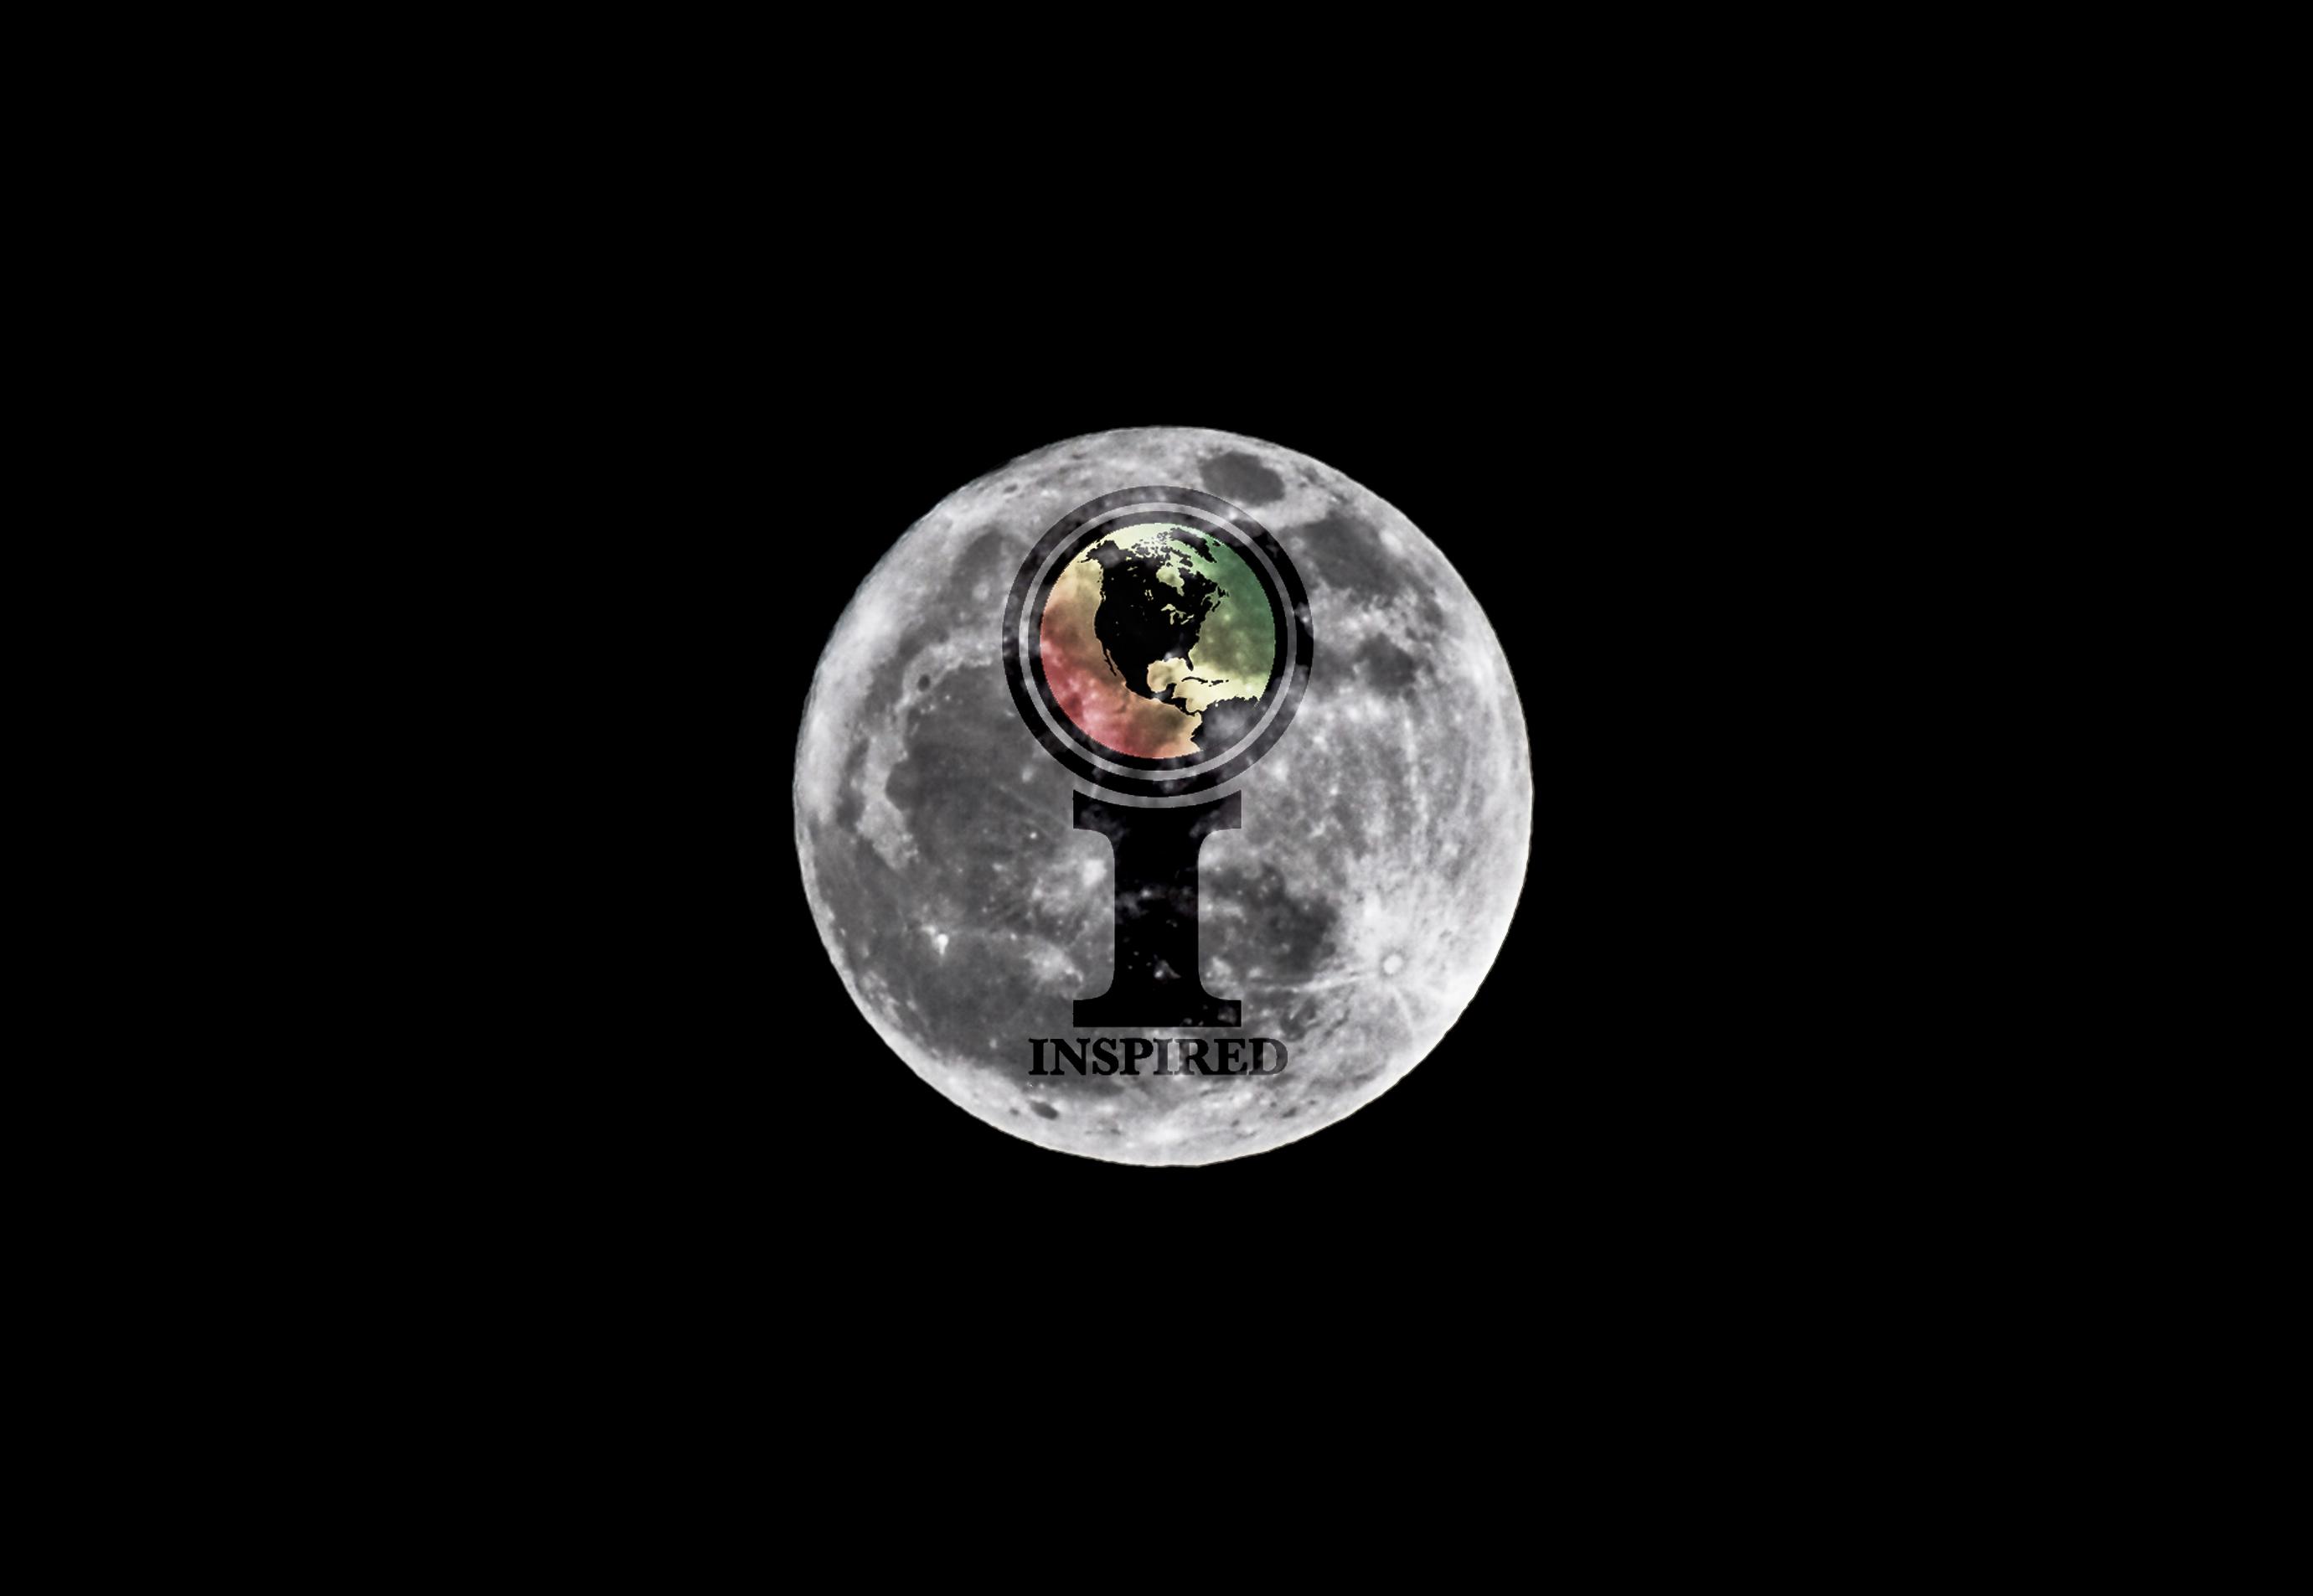 Inspired moon